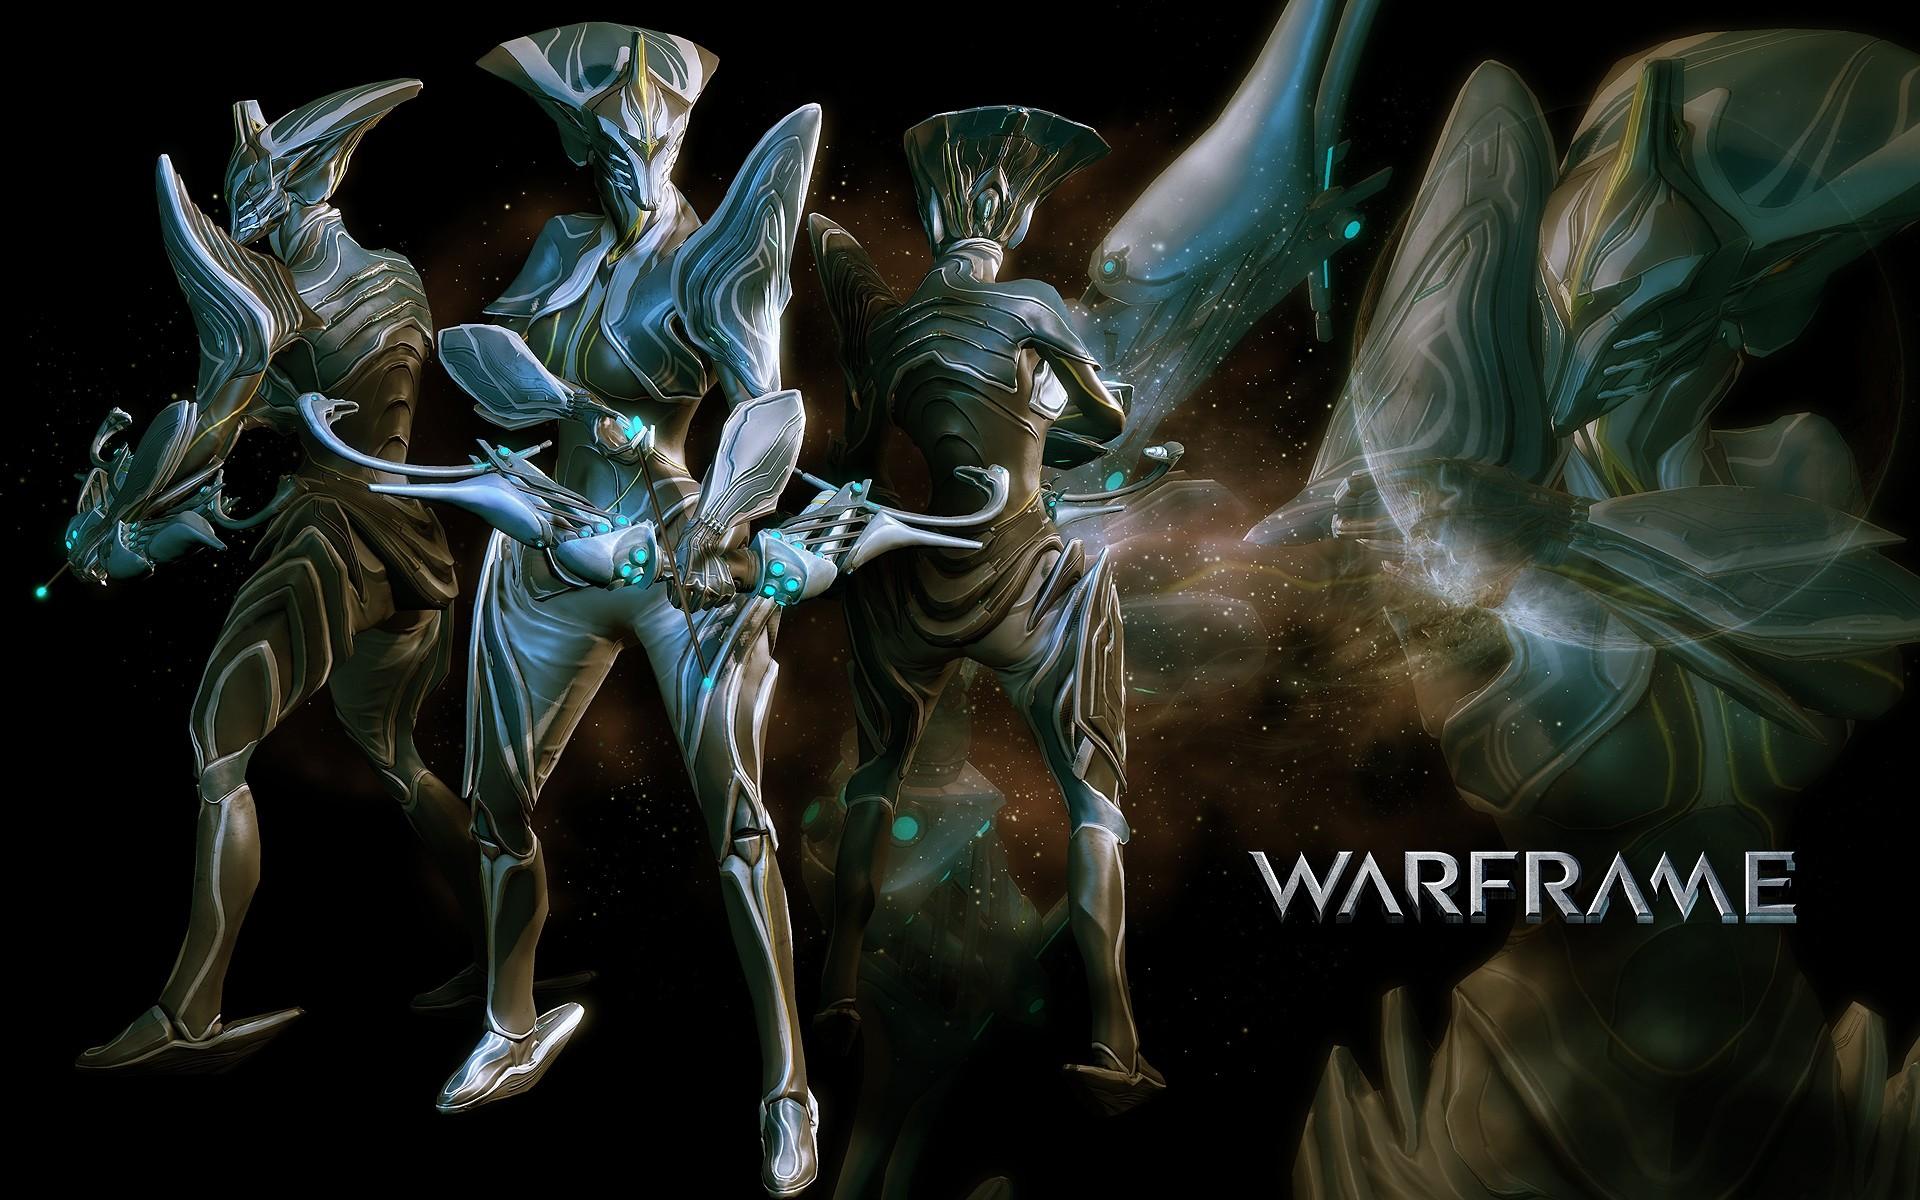 Warframe Computer Wallpapers, Desktop Backgrounds .